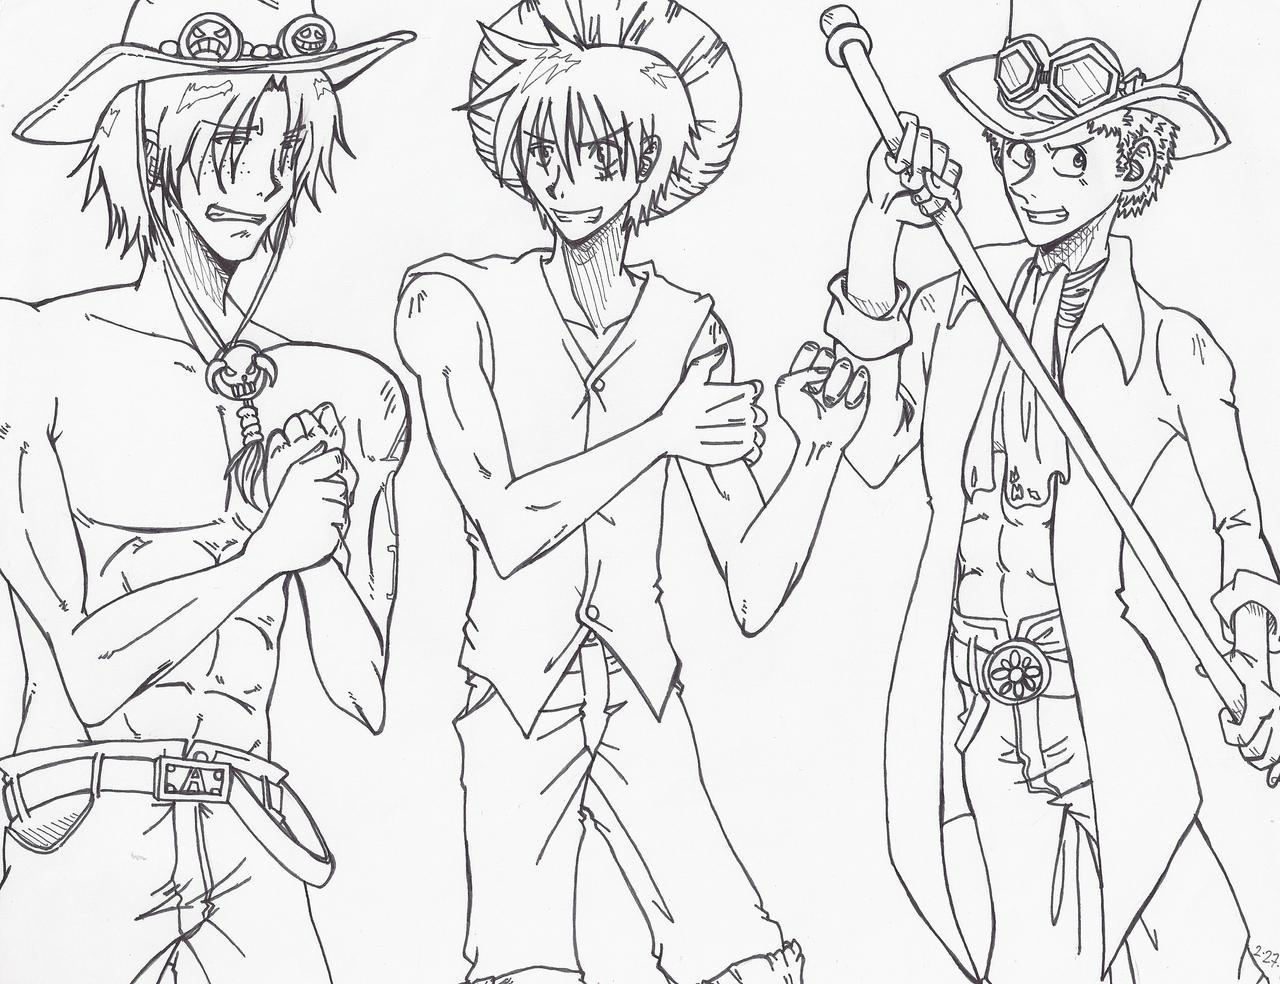 Marimokun Ace Luffy Sabo by Marimokun